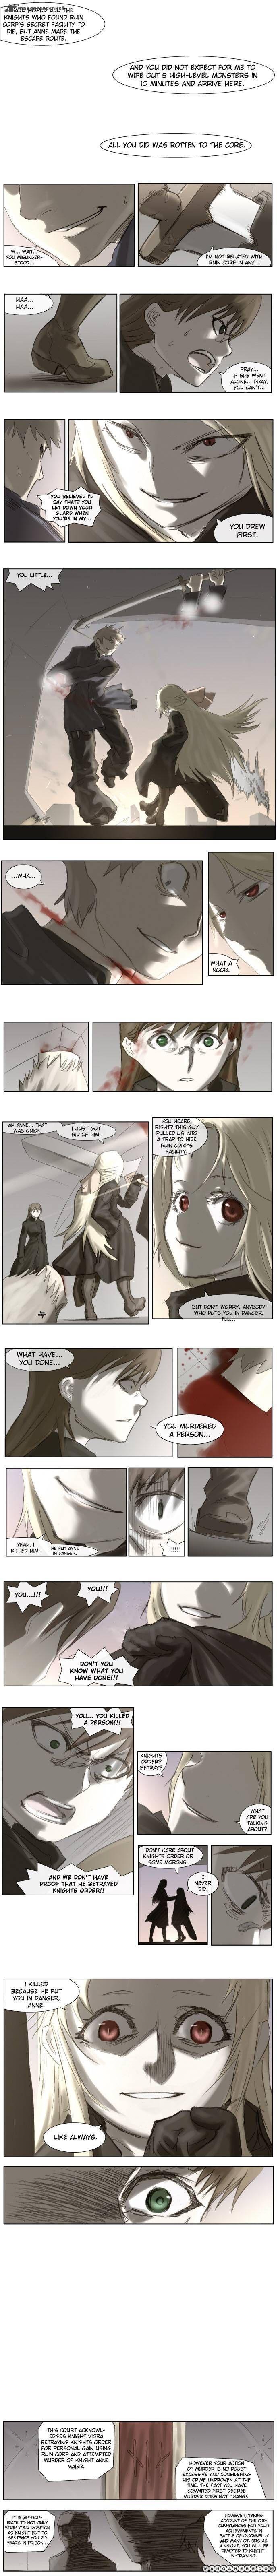 Knight Run 27 Page 1